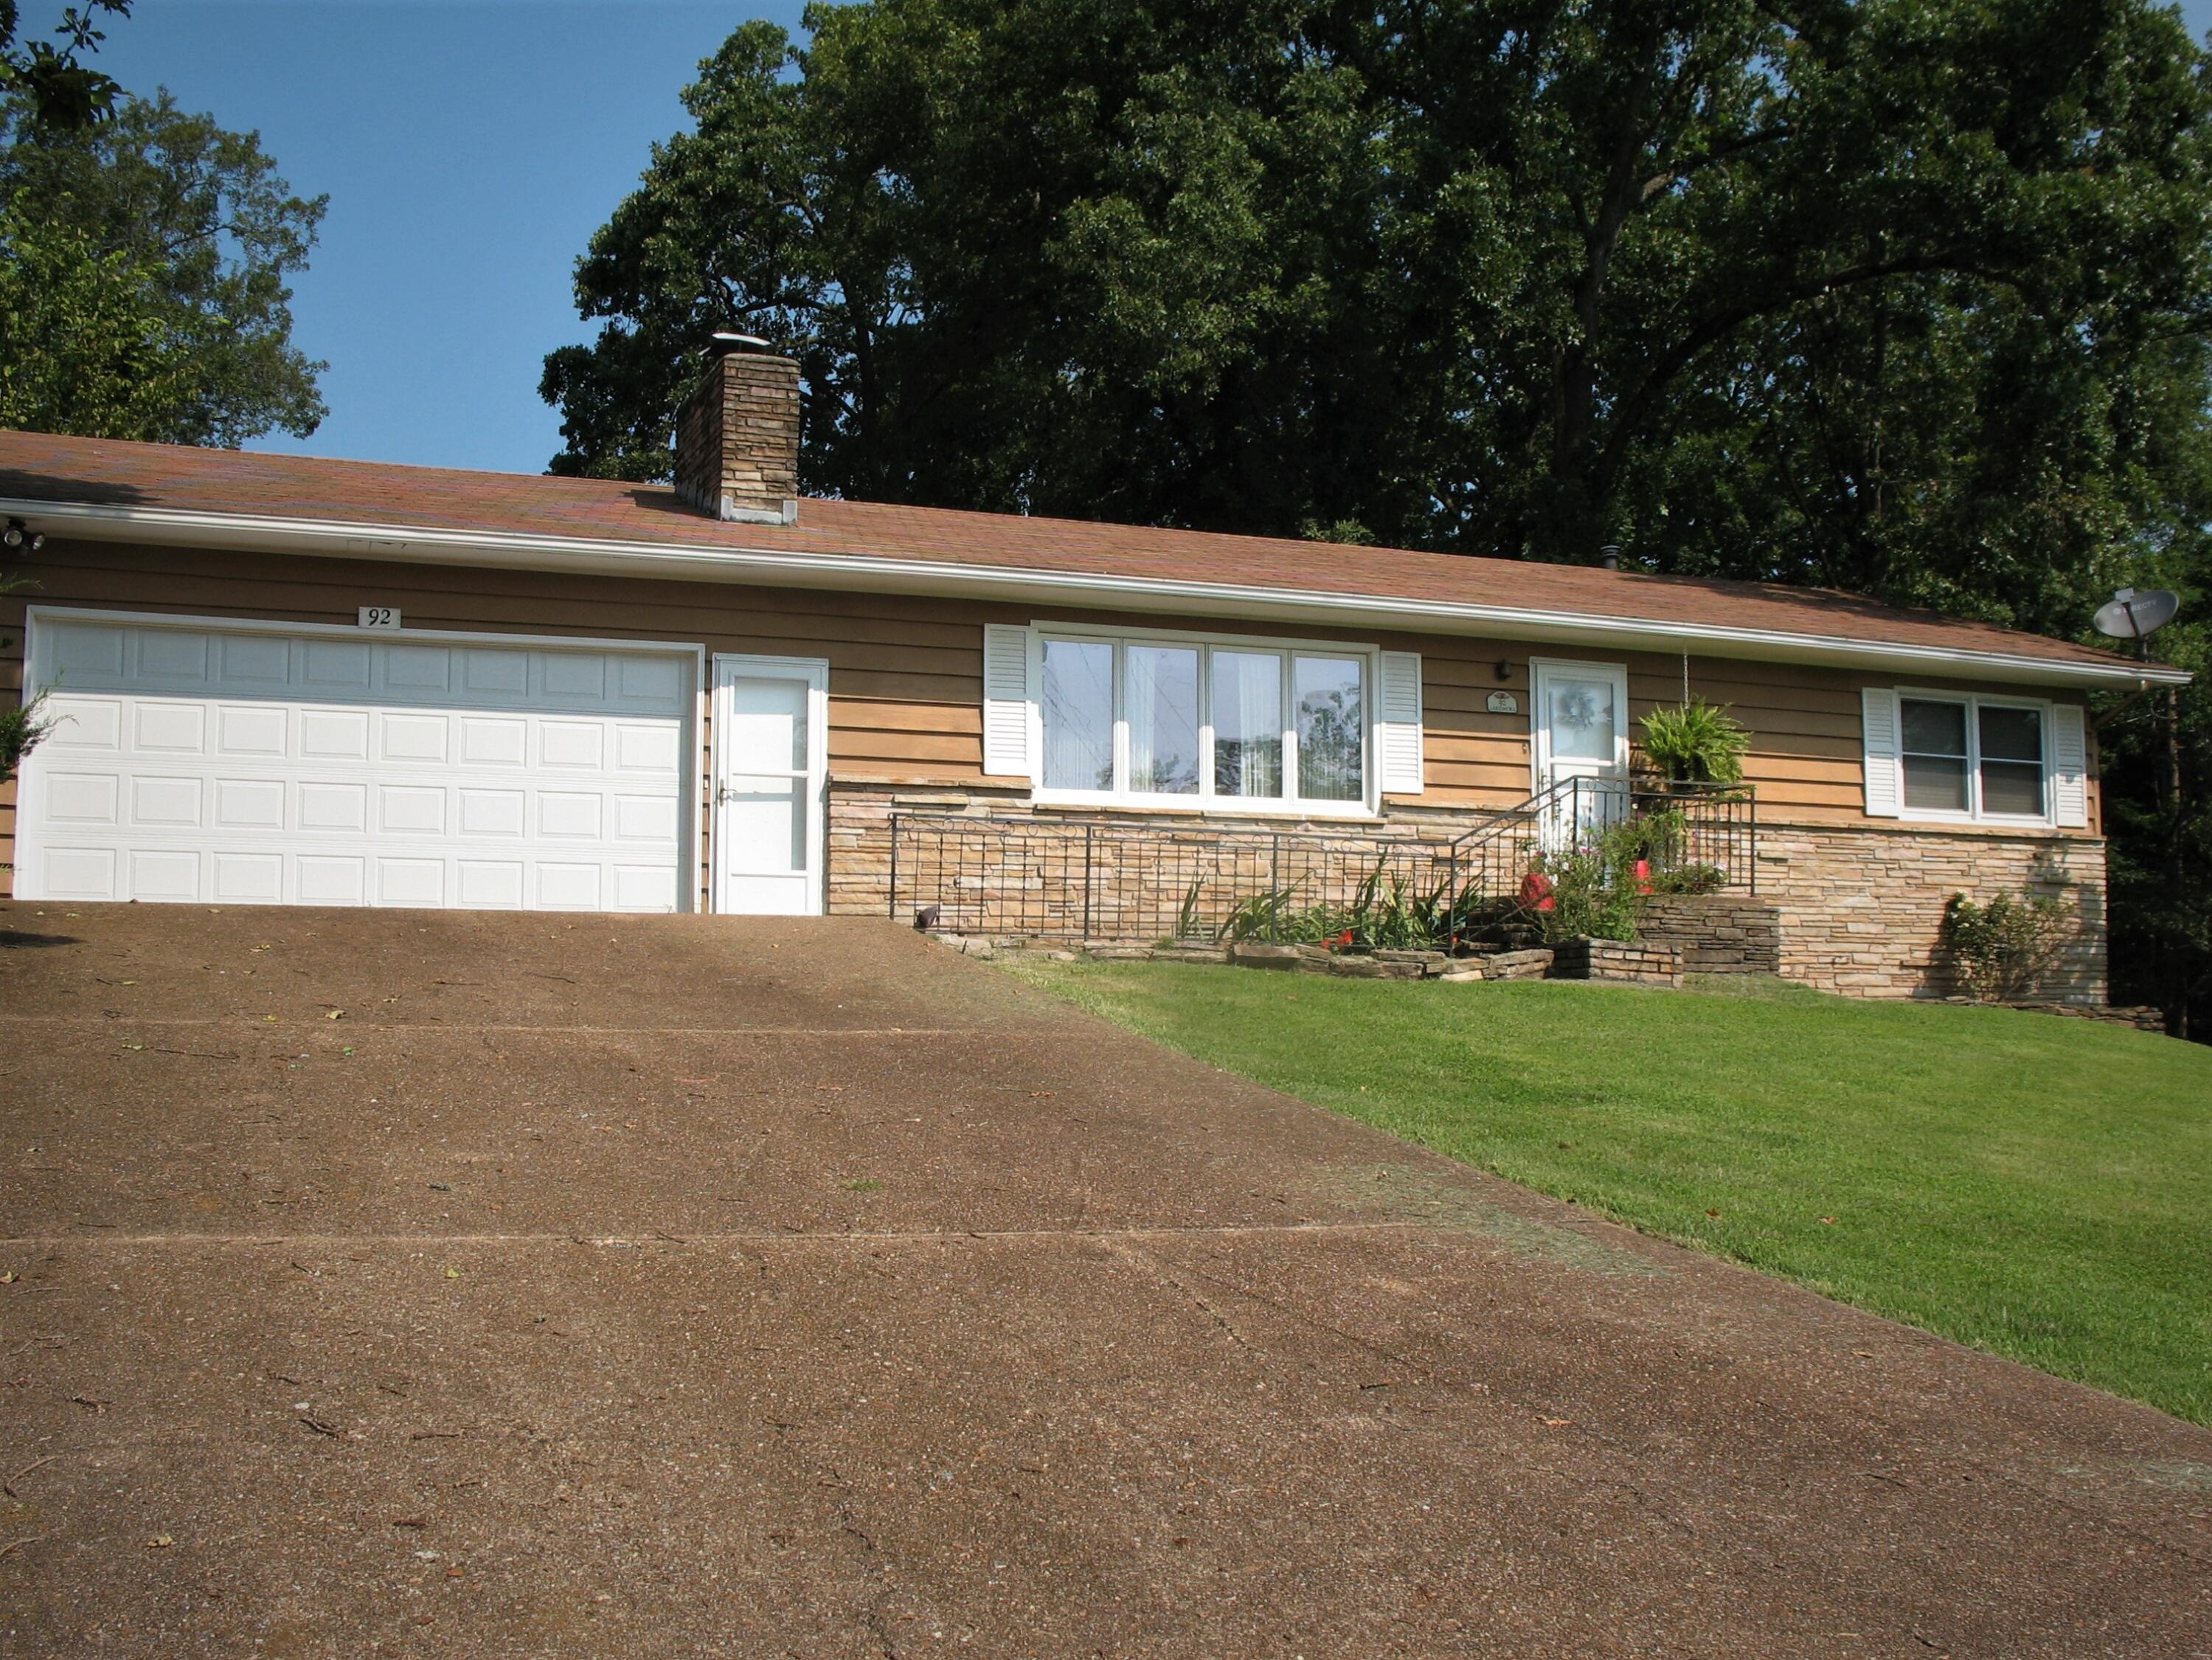 92 Lakeshore Drive Kimberling City, MO 65686